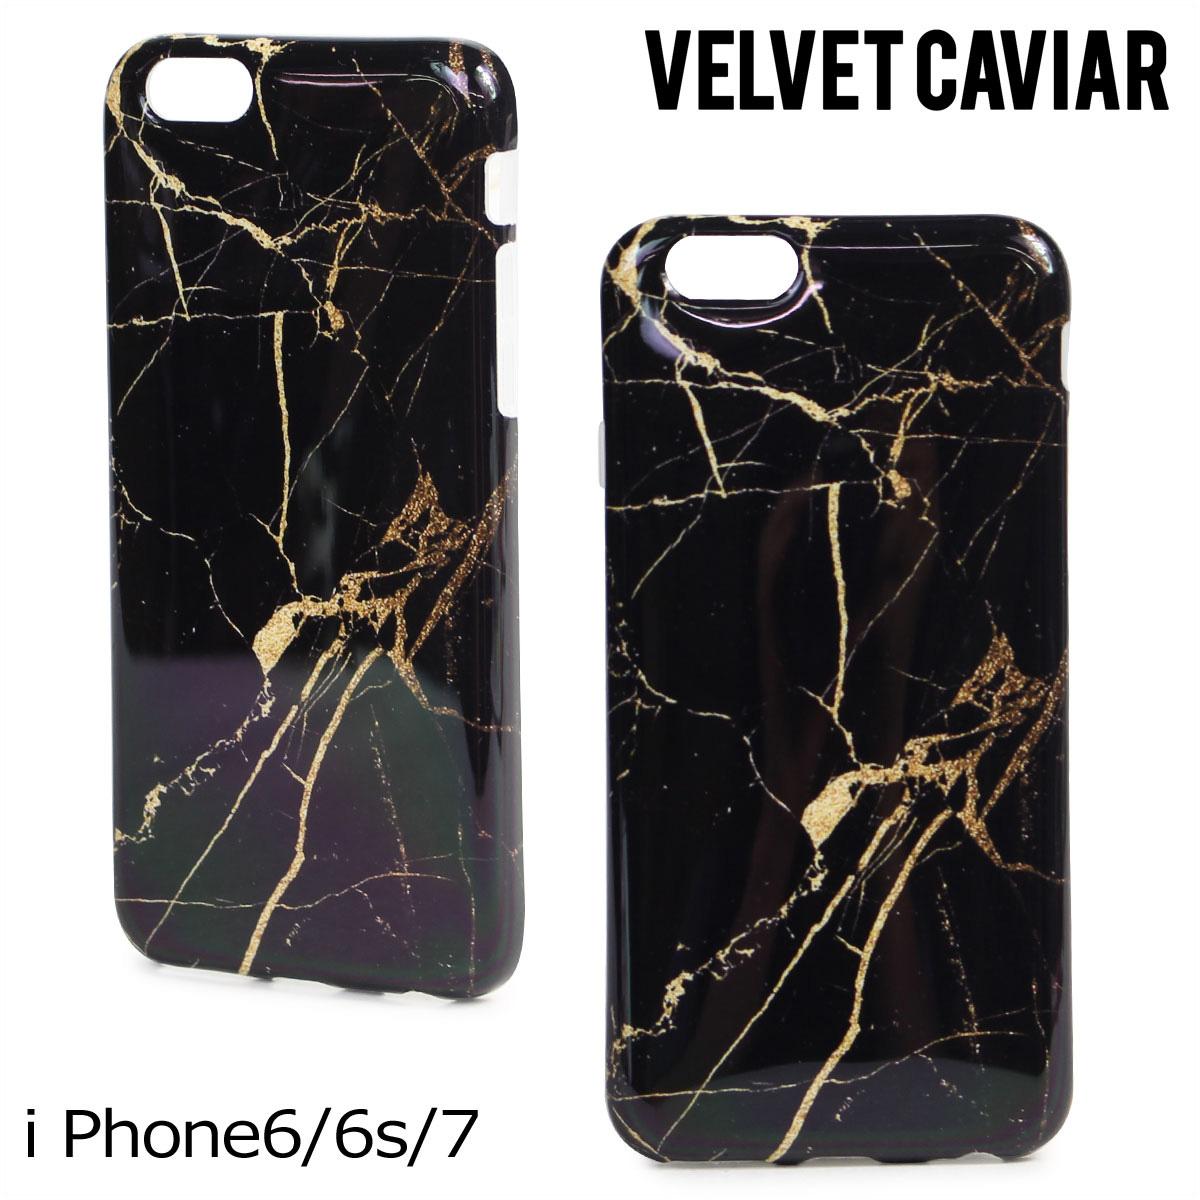 the latest 24f34 eb000 Velvet caviar Velvet Caviar iPhone7 6 6s case smartphone iPhone case  eyephone iPhone velvet BLACK & GOLD MARBLE IPHONE CASE Lady's black gold  [176]